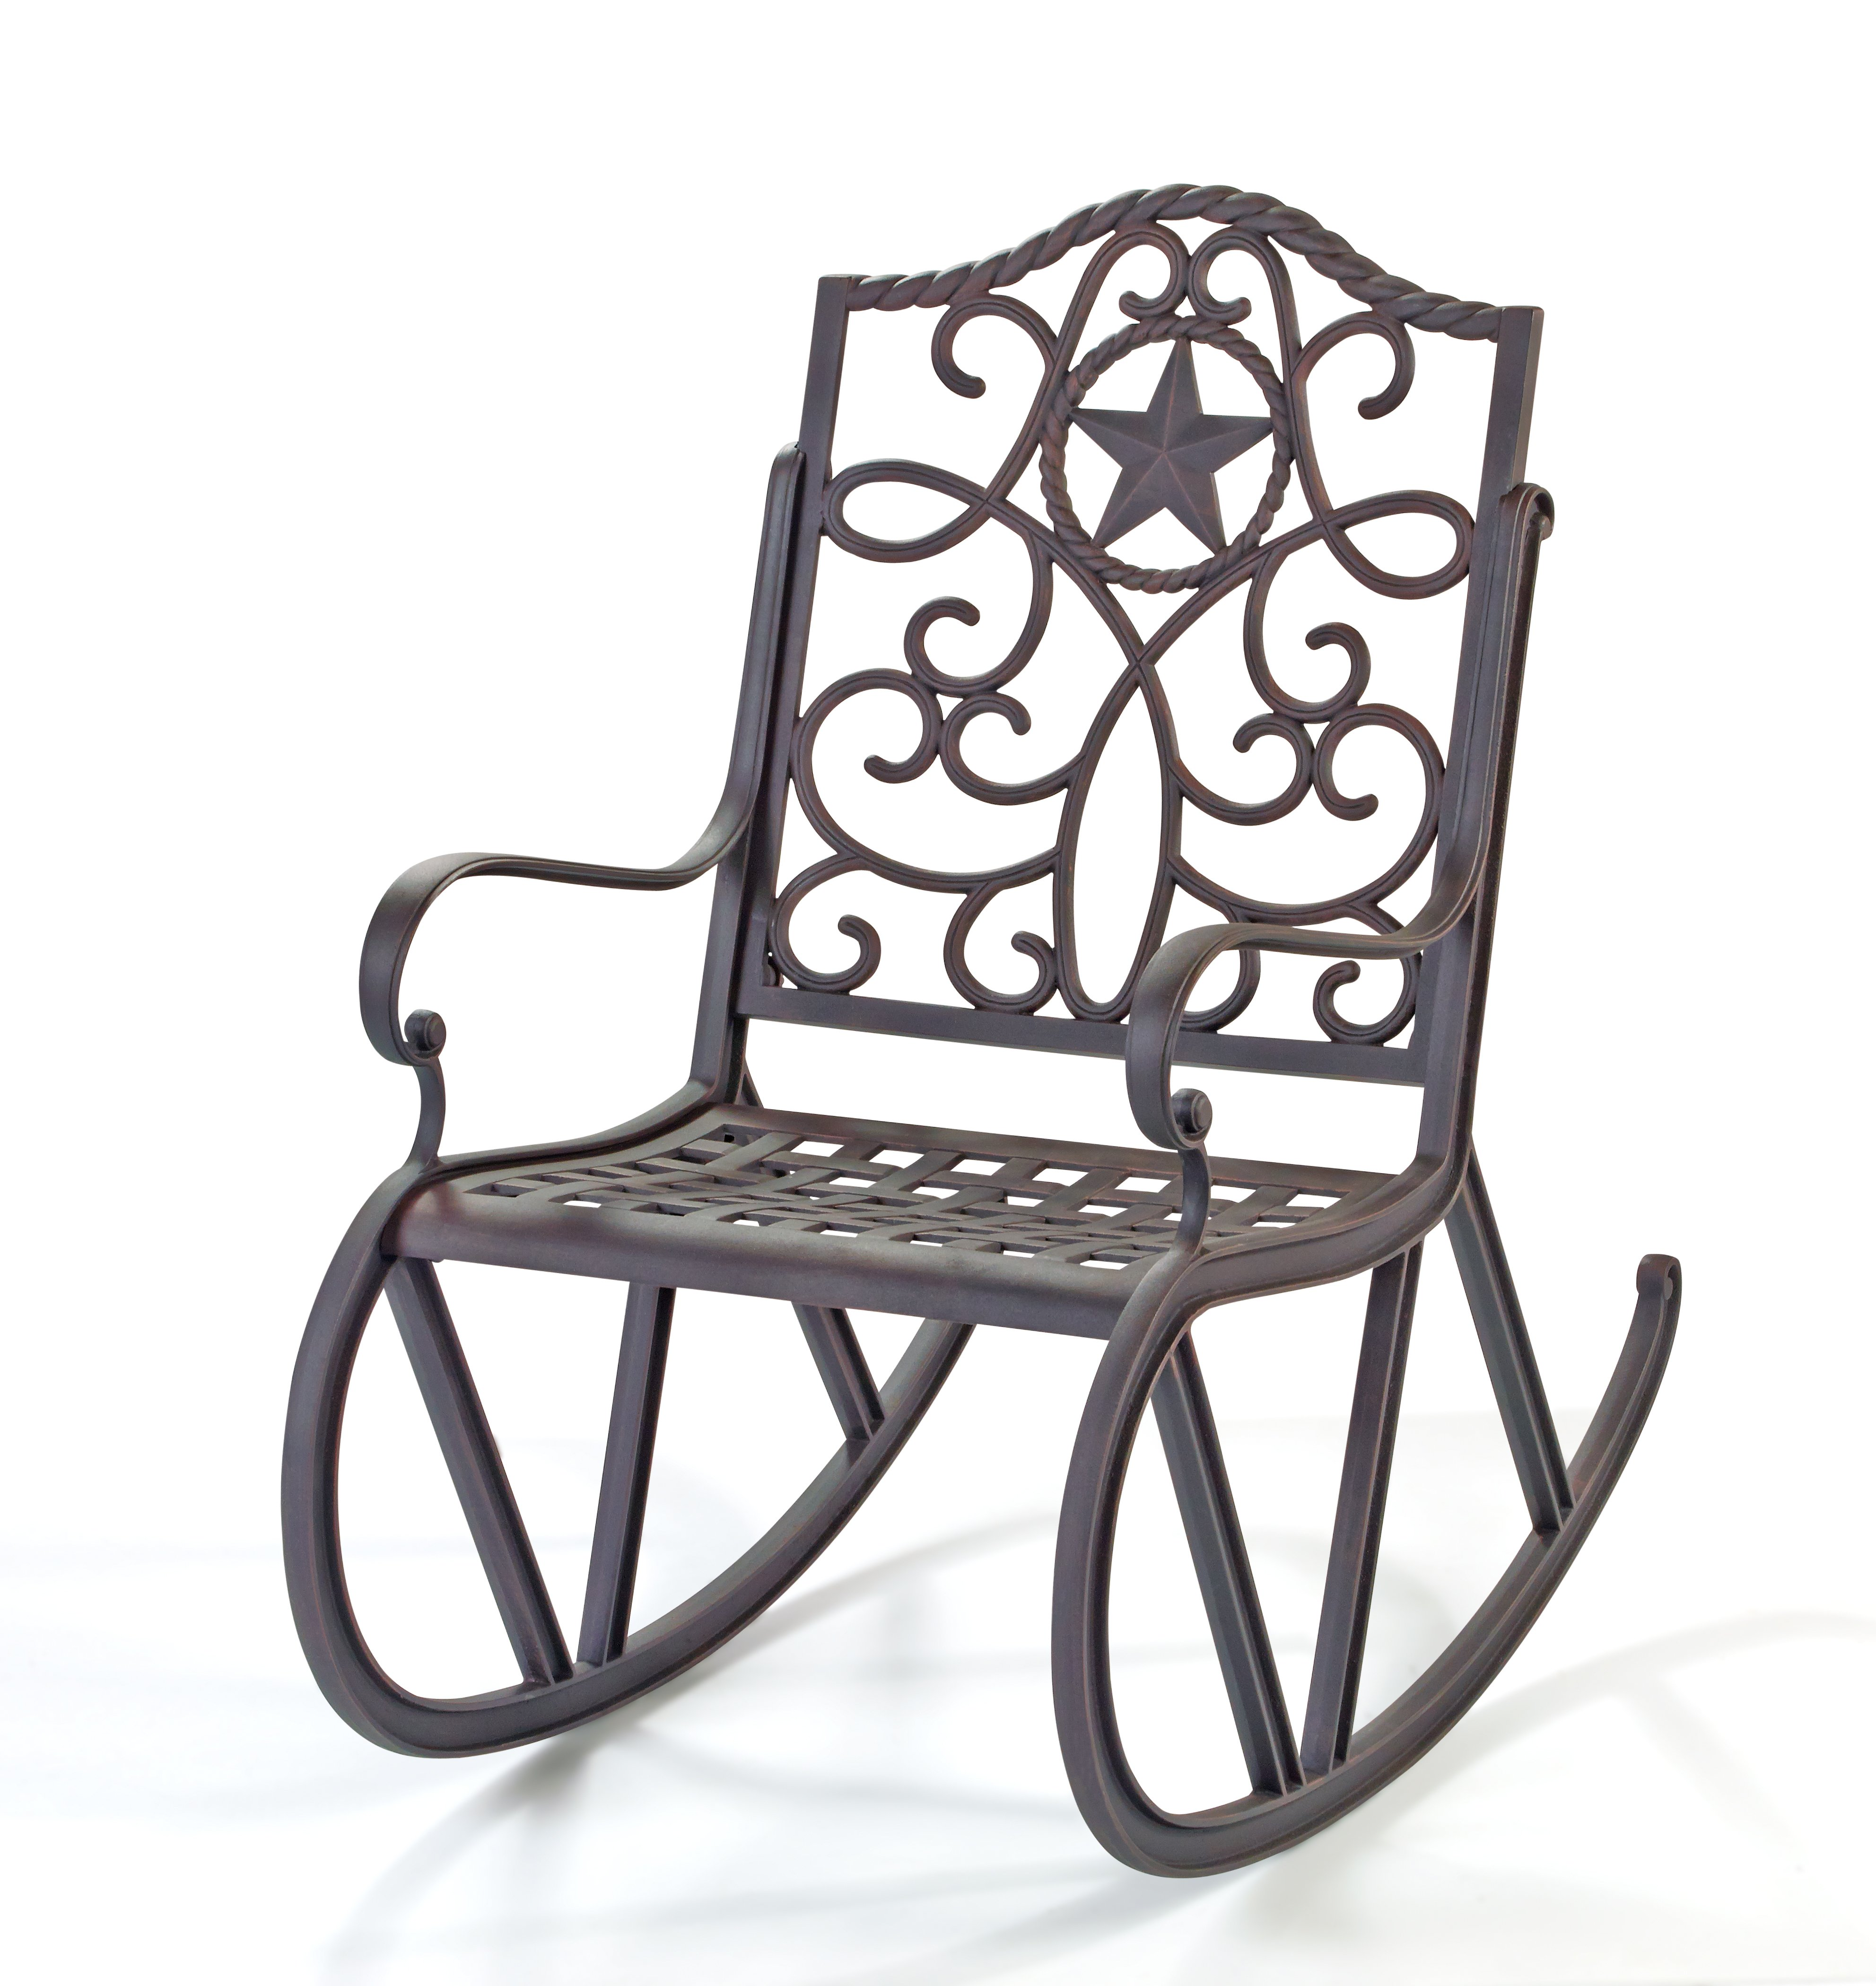 Hu2011Eu2011B Texas Backyard Riata III Single Scroll Rocker U2011 Shop Furniture At HEB